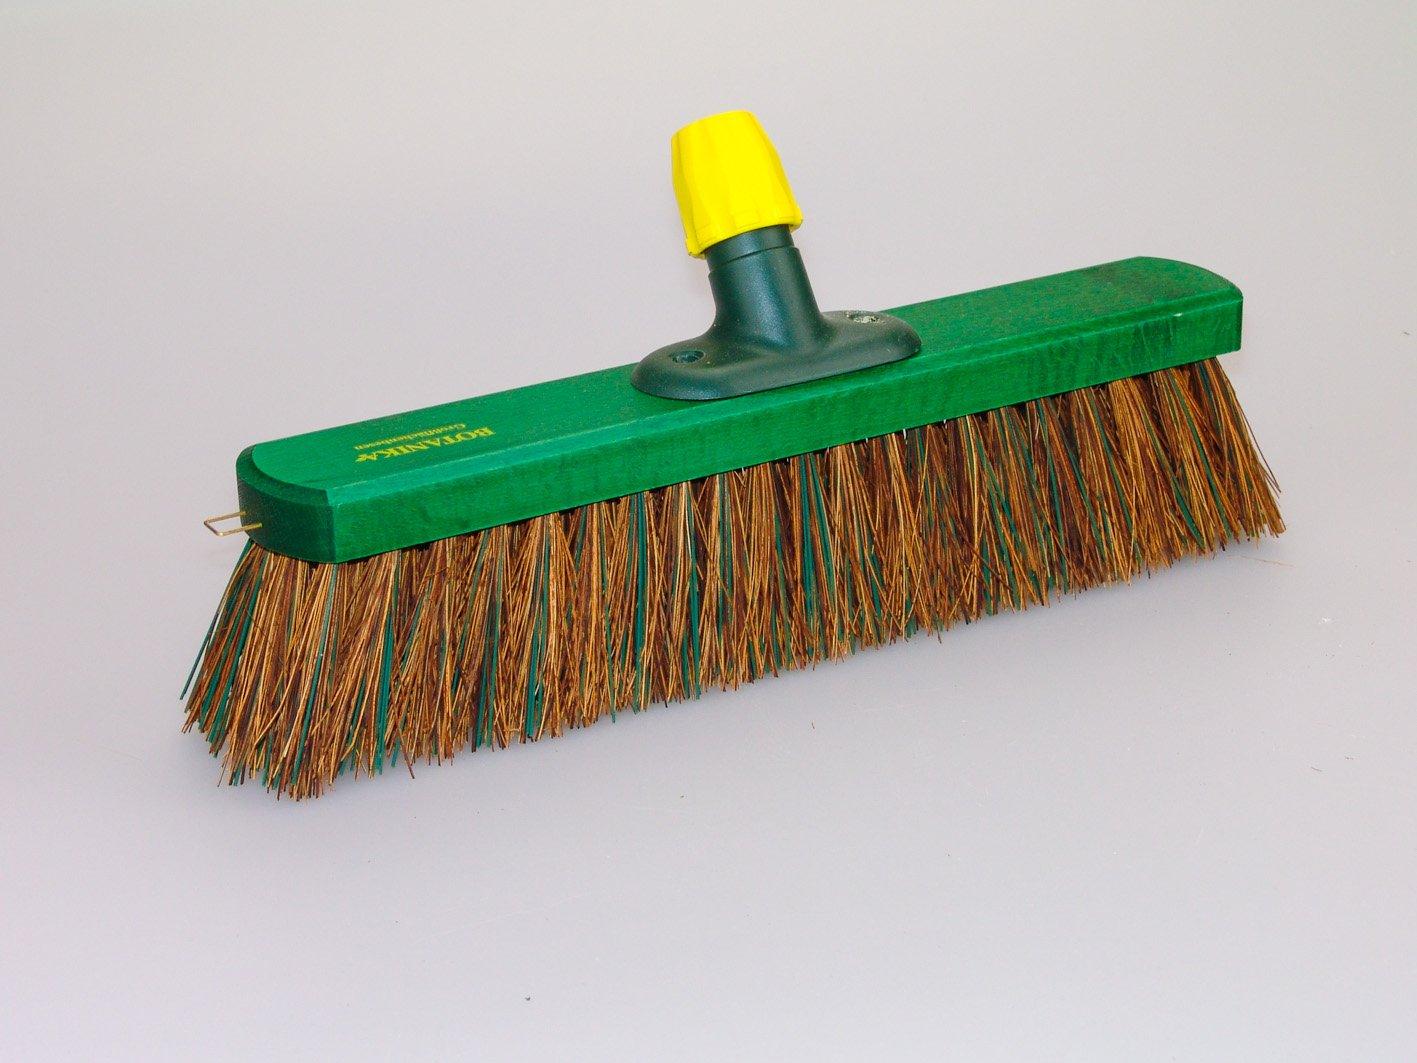 Bümag Large Brush Head, Plastic/Natural Fibre, 40cm, Multi-Coloured 003/0113